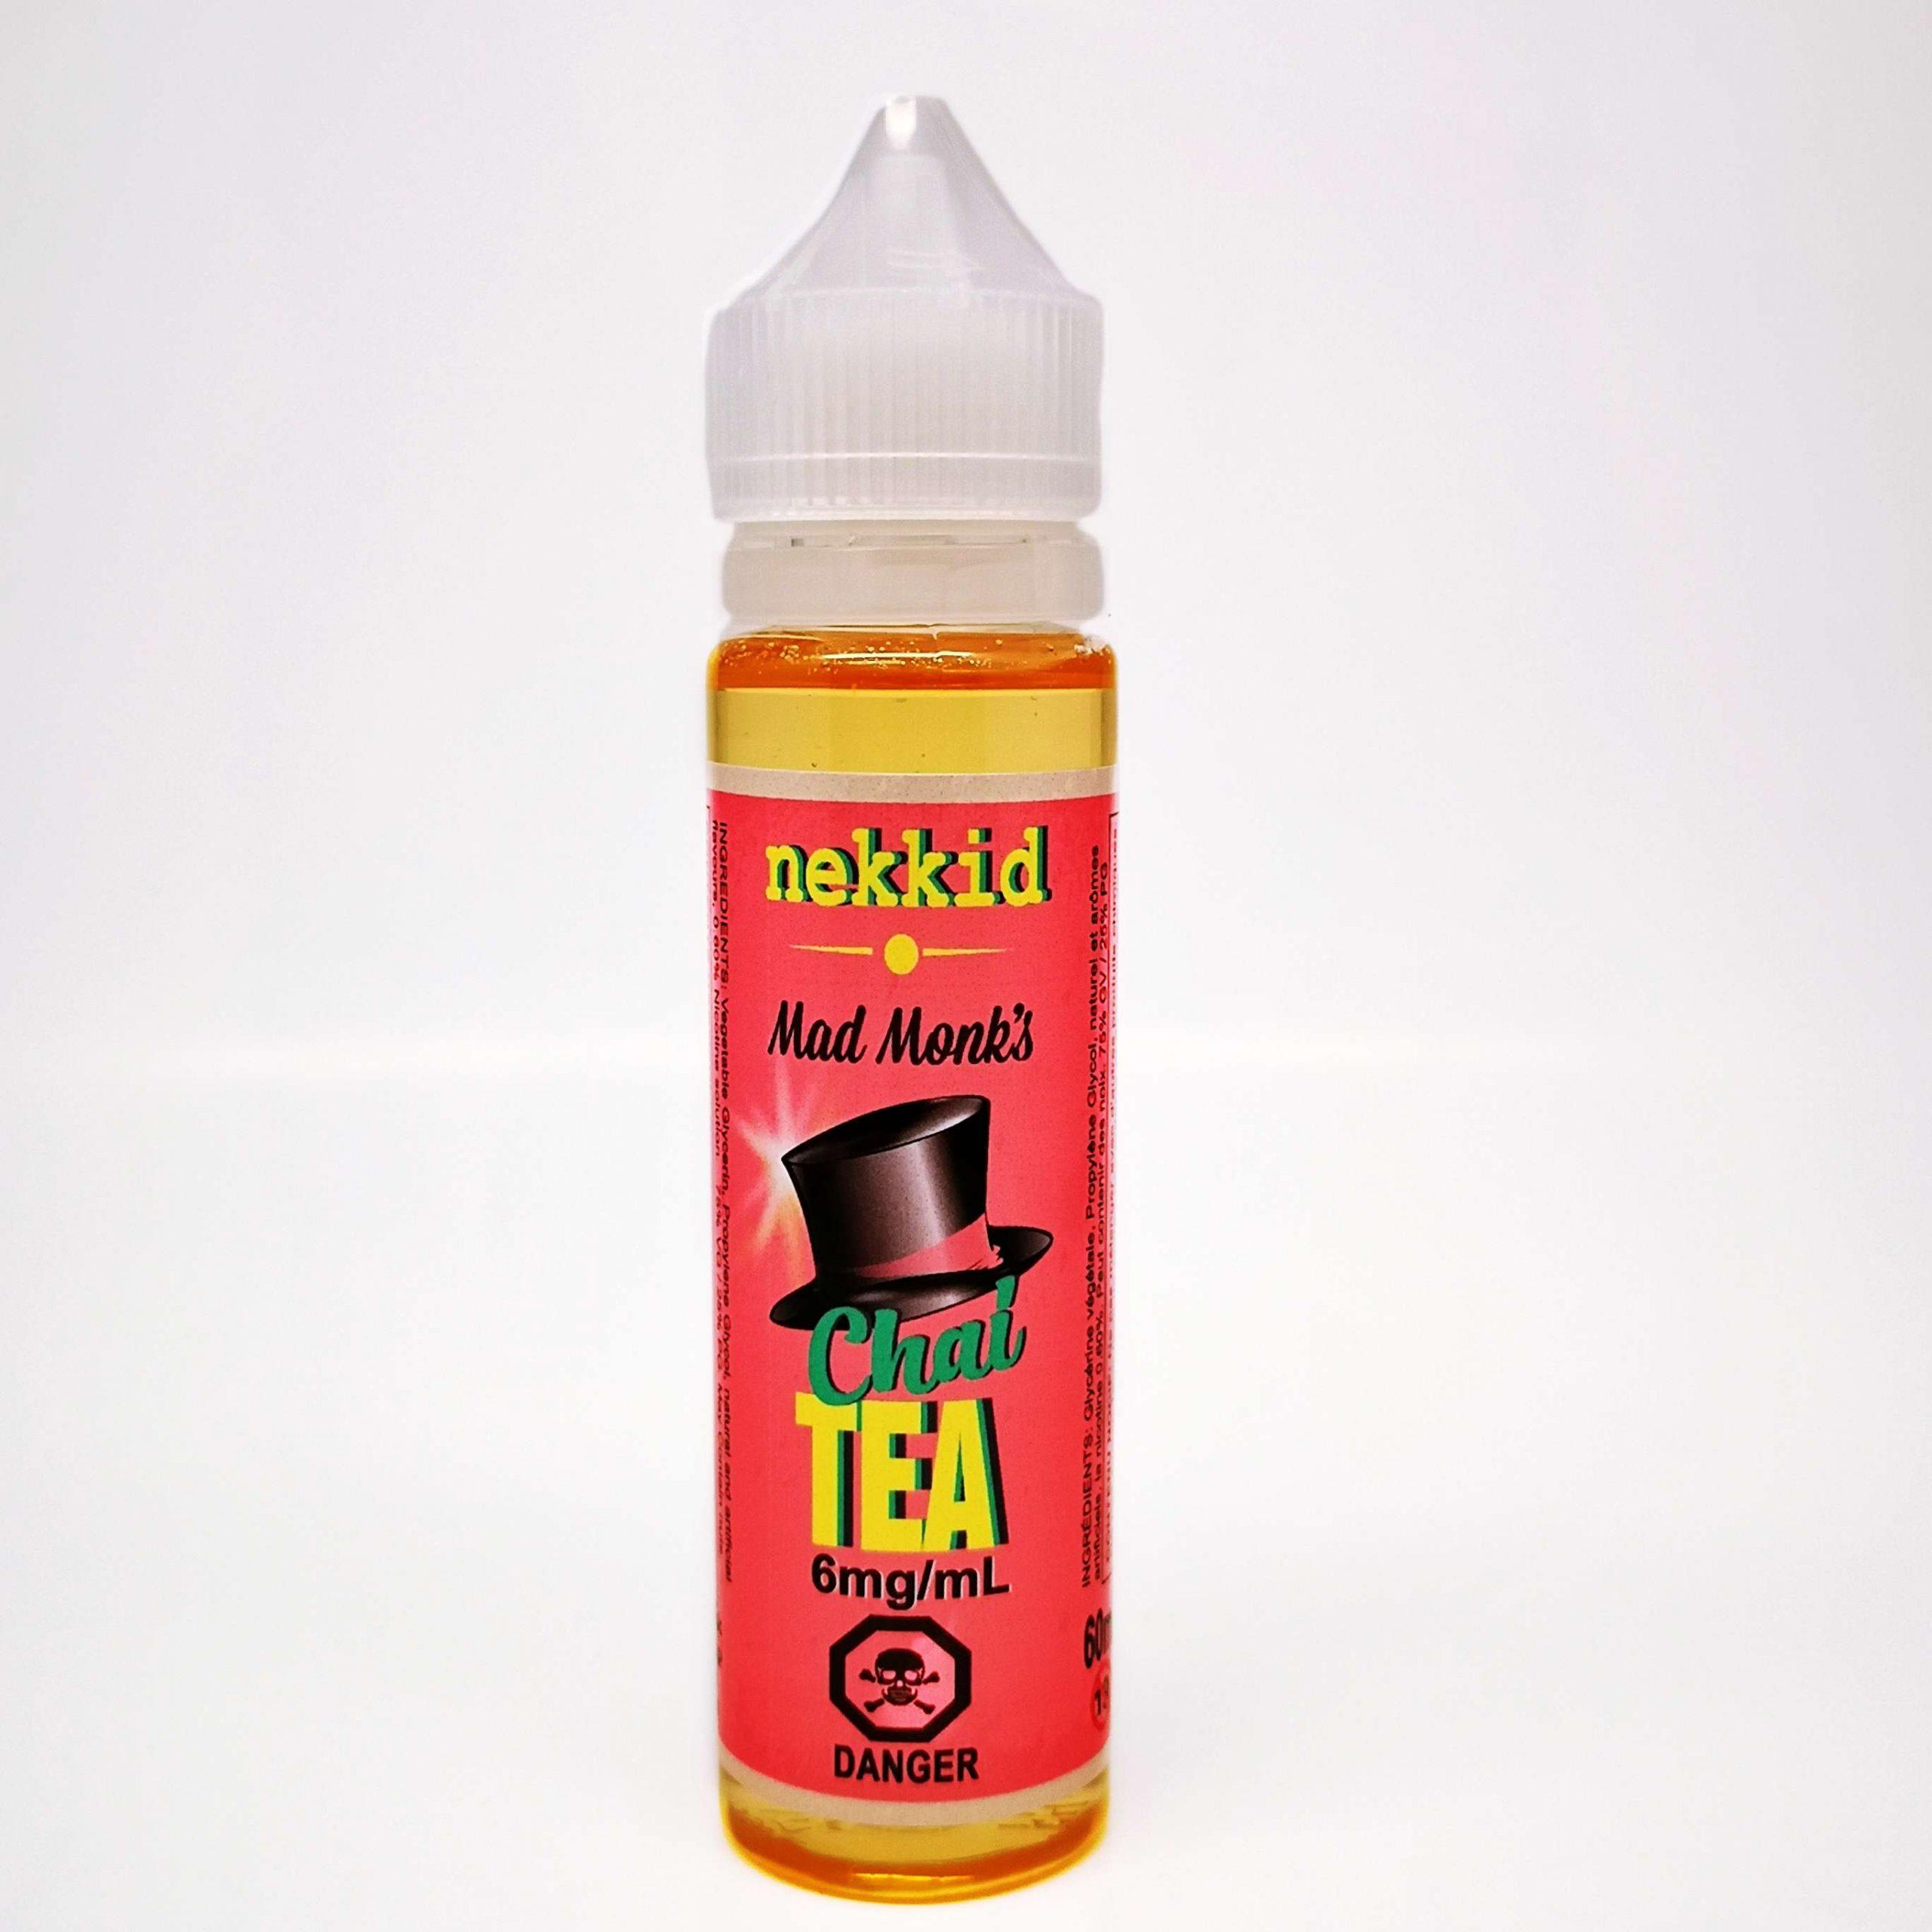 Mad Monk's Chai Tea